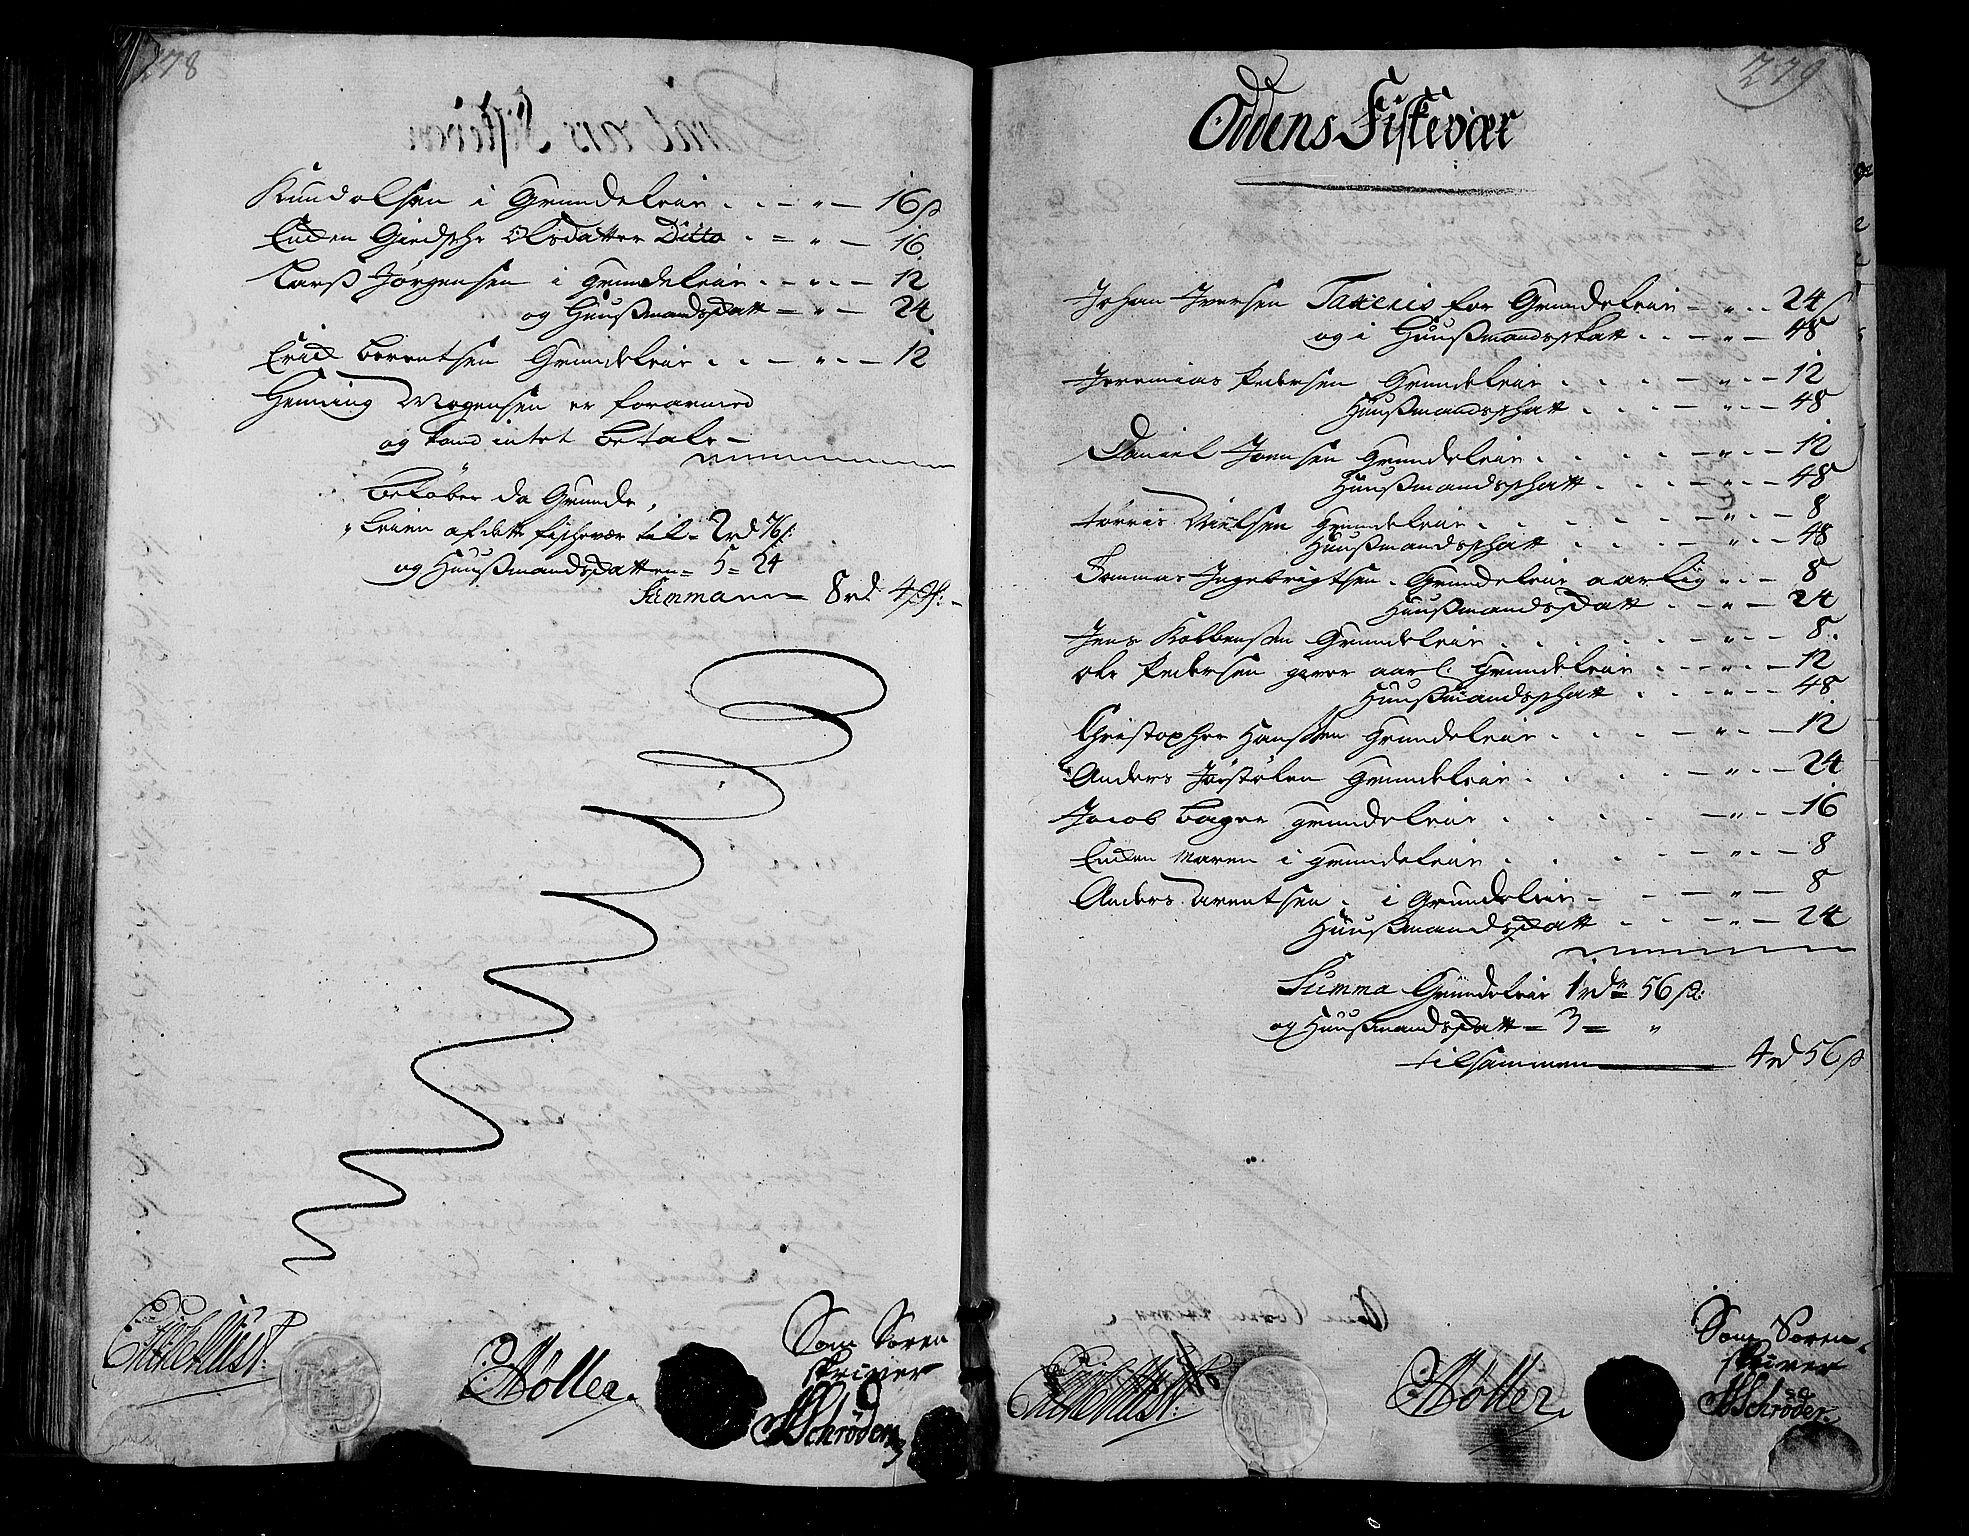 RA, Rentekammeret inntil 1814, Realistisk ordnet avdeling, N/Nb/Nbf/L0155: Nordmøre matrikkelprotokoll, 1721-1723, s. 278-279